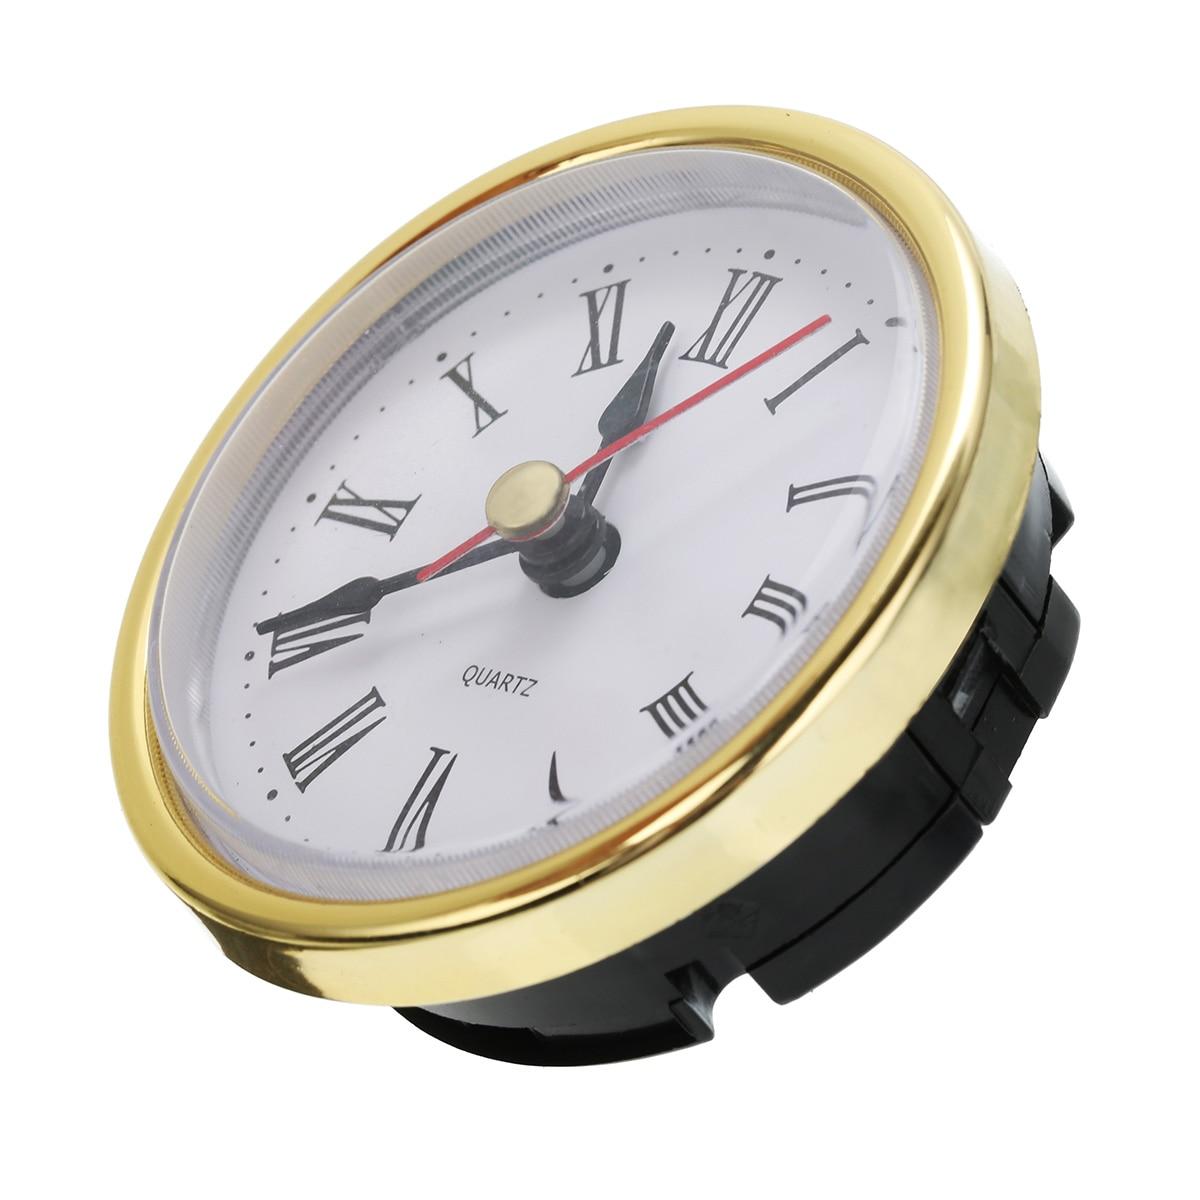 "Classic Clock Craft Quartz Movement 2-1/2"" (65mm) Round Clocks Head Insert Roman Number Mayitr"